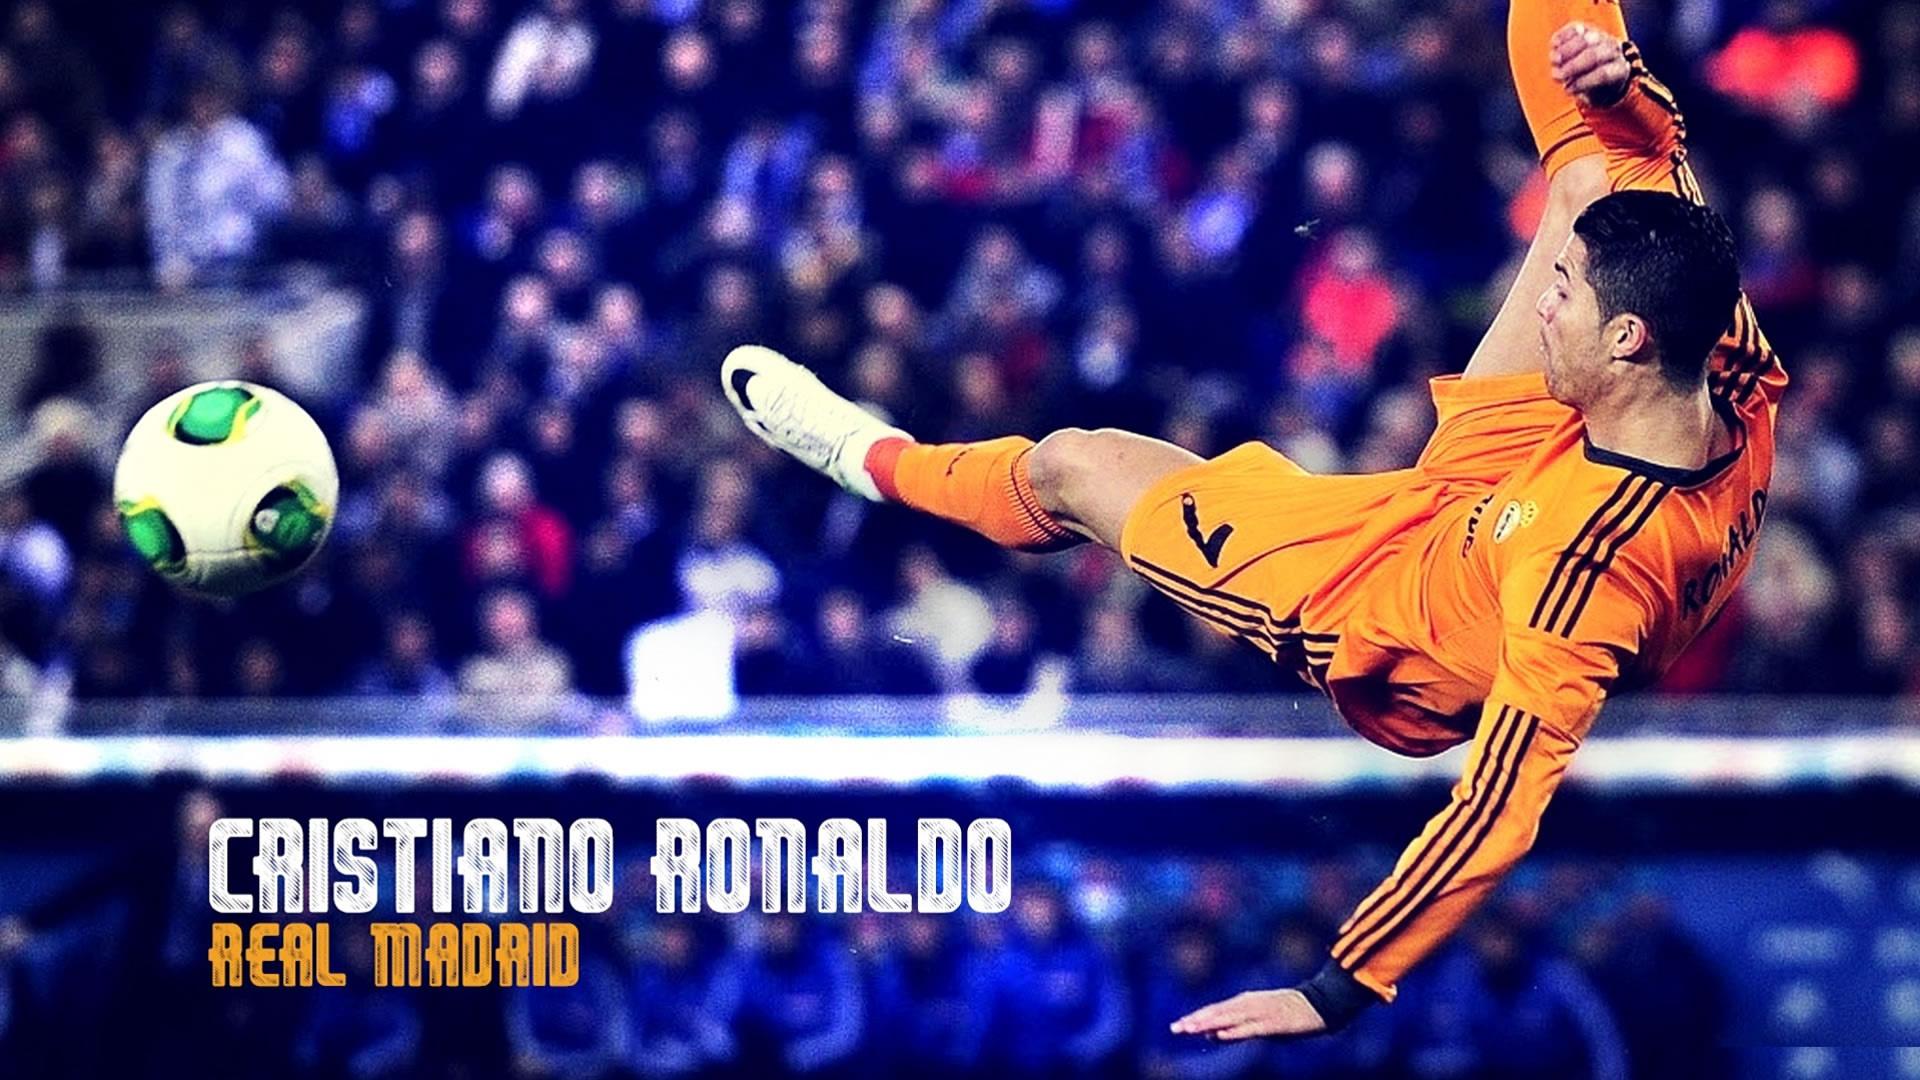 Ronaldo bicycle kick wallpaper   Cristiano Ronaldo Wallpapers 1920x1080